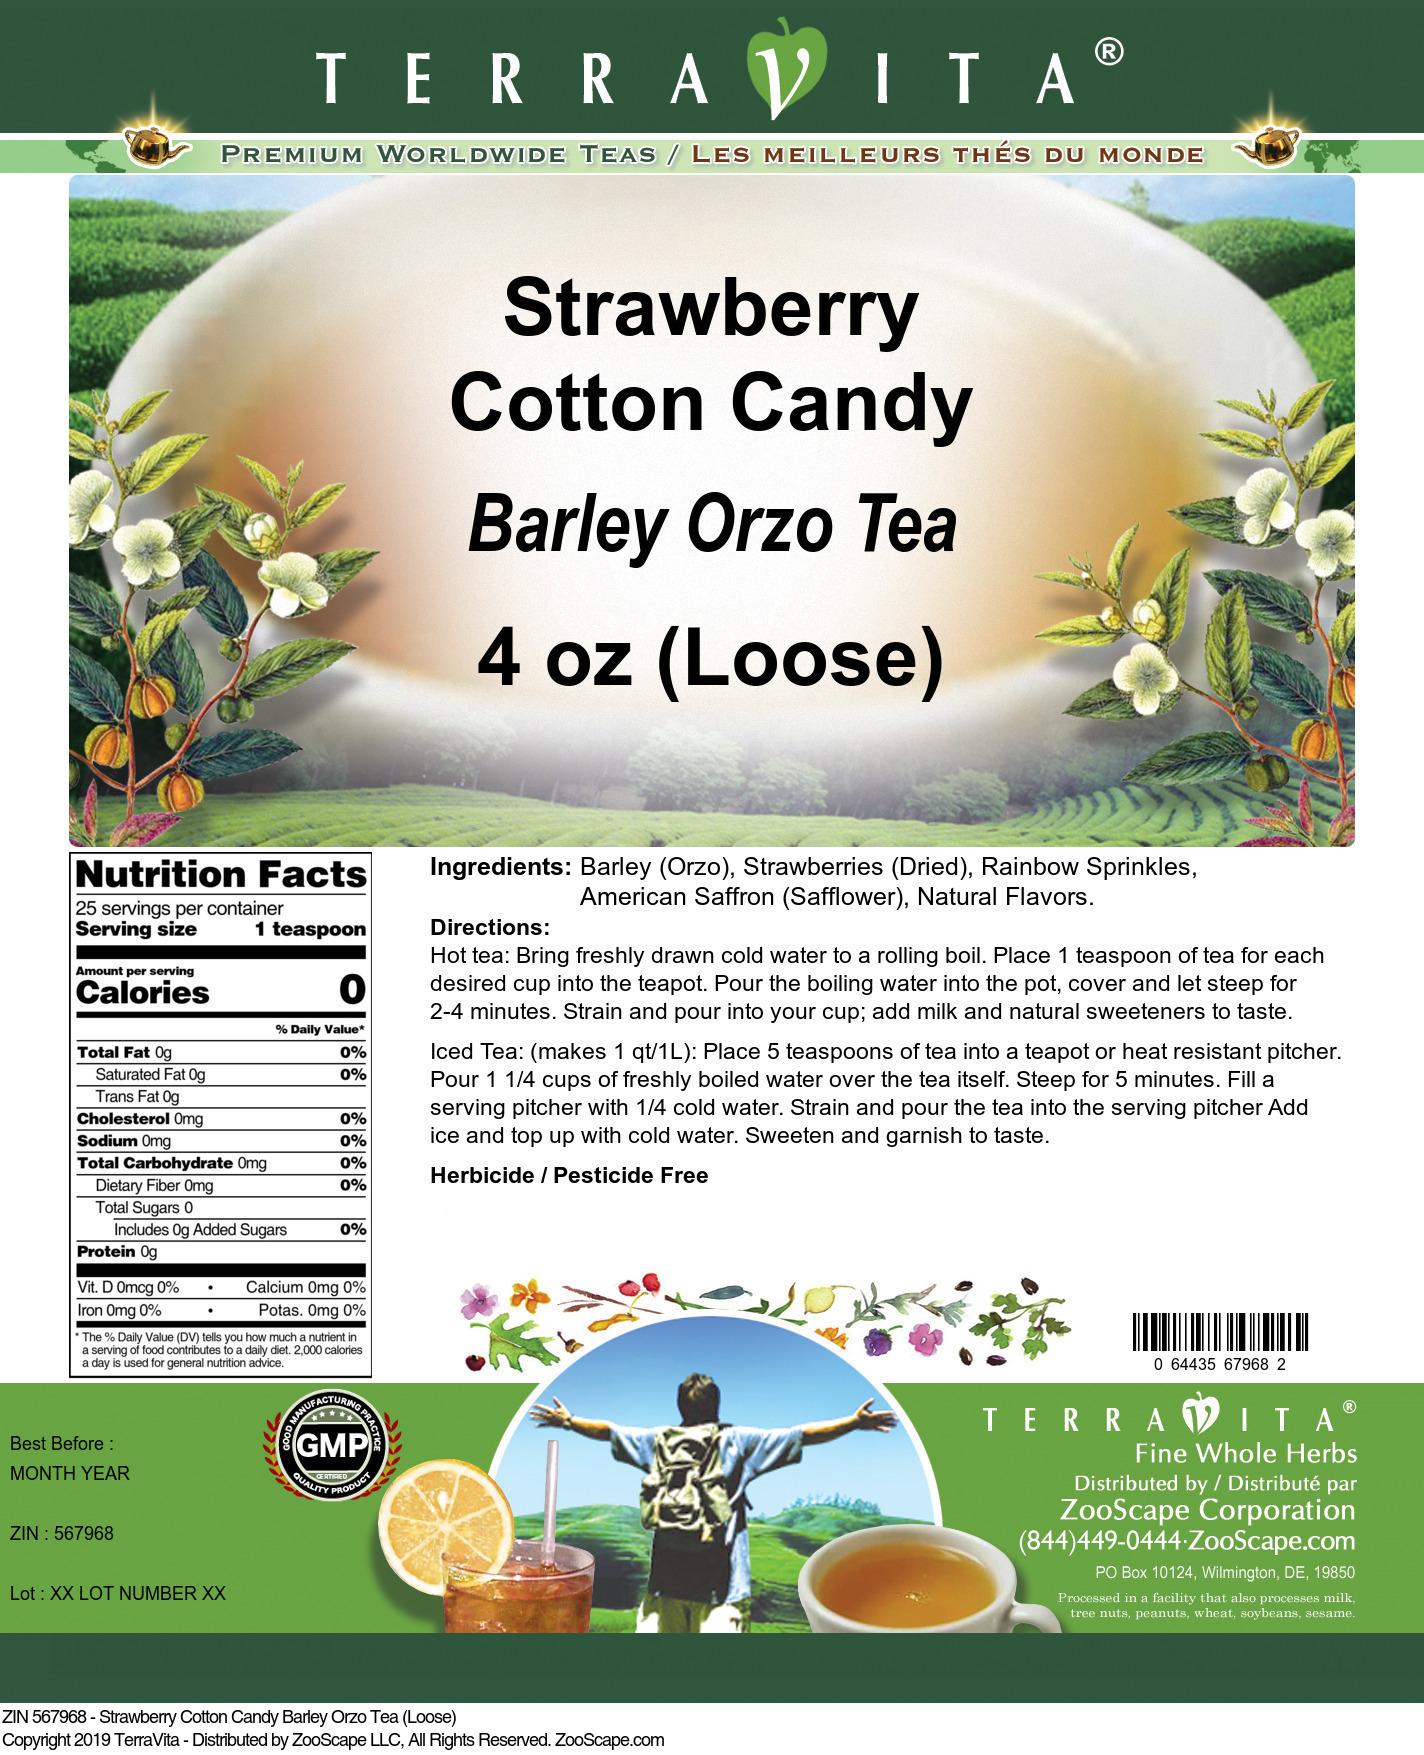 Strawberry Cotton Candy Barley Orzo